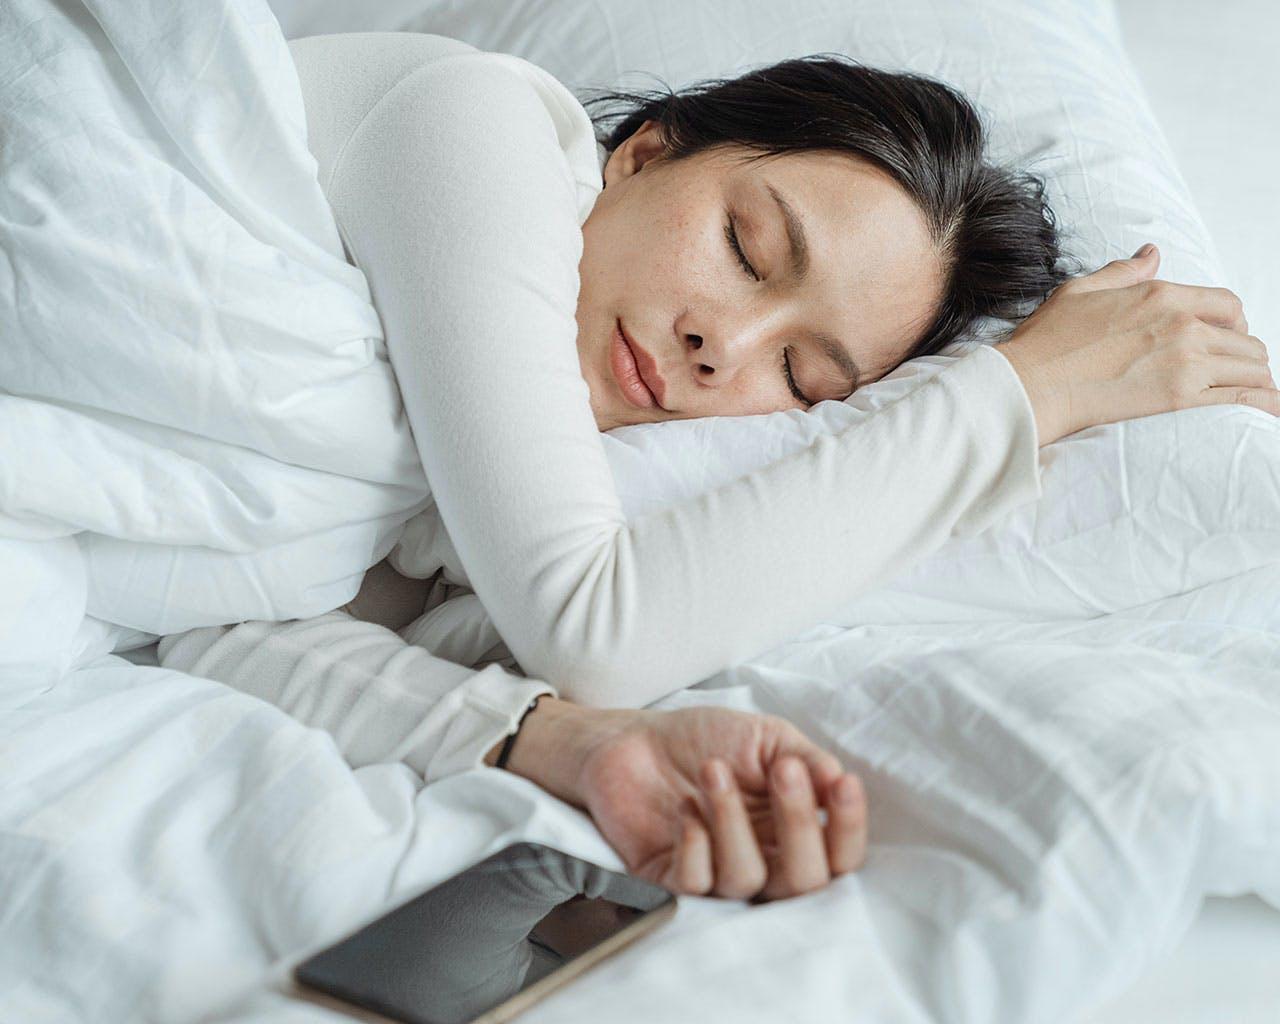 Achieve Deep Sleep Through Music With This 16-Hour Playlist